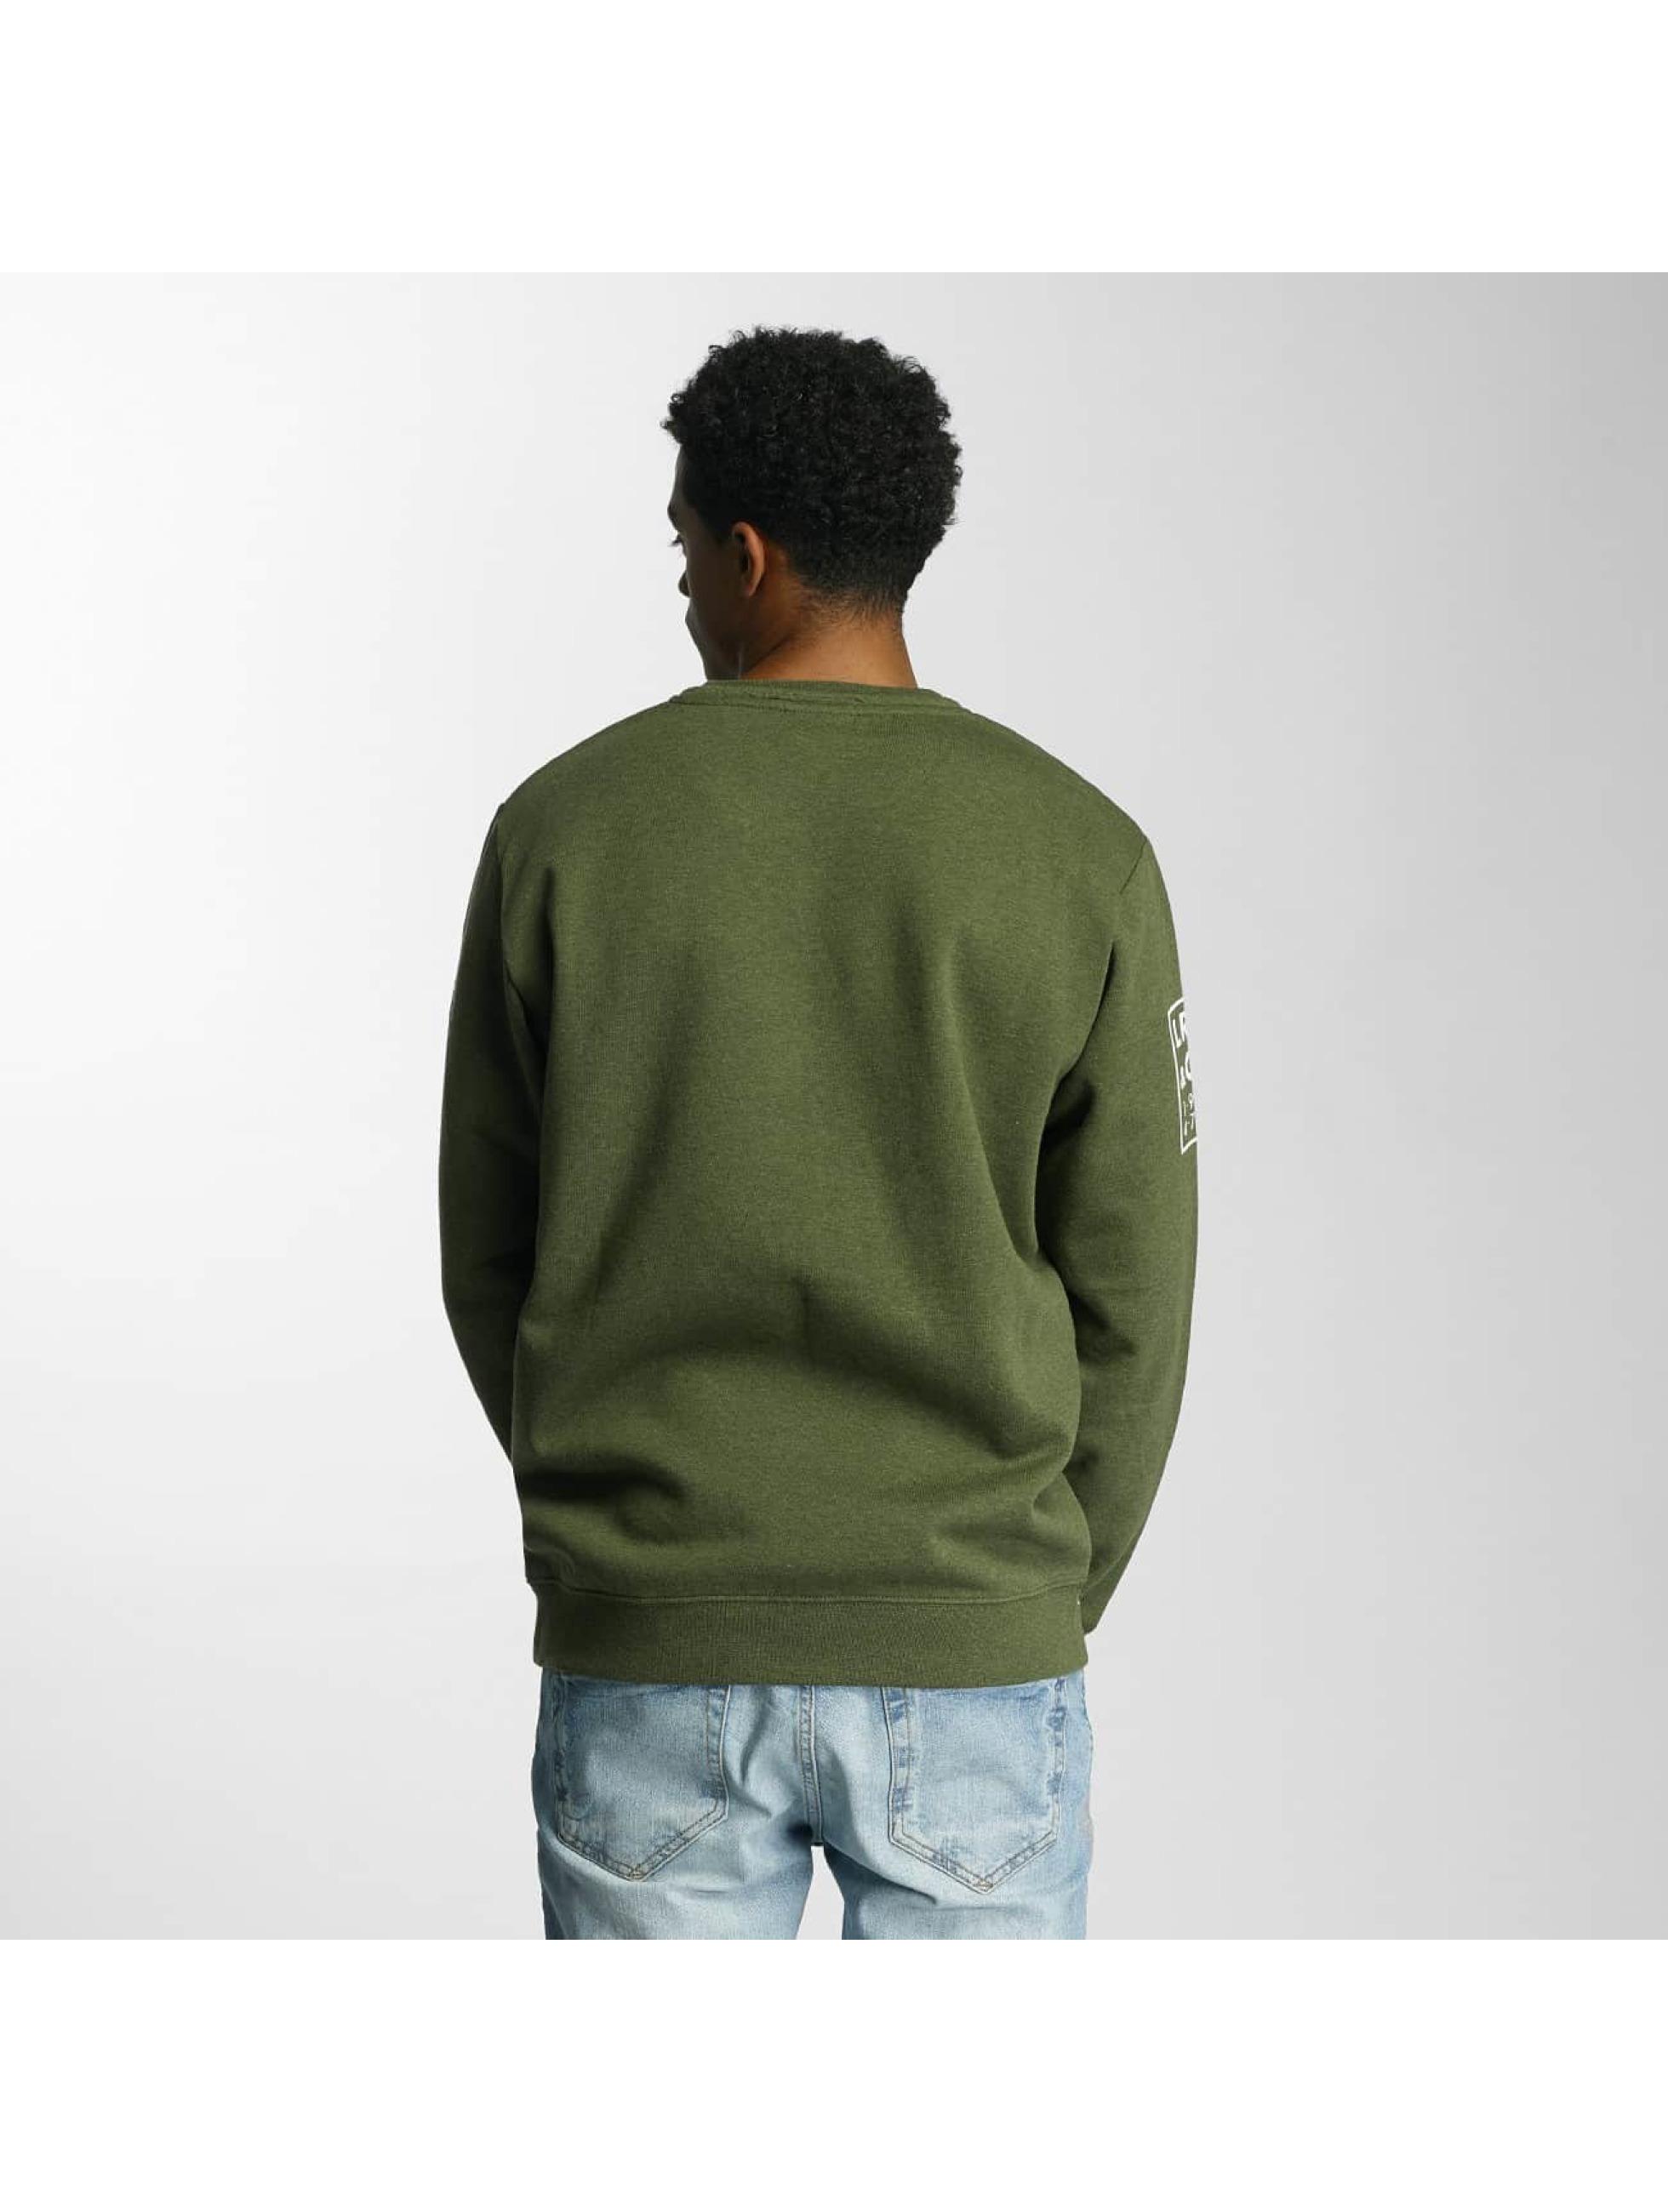 LRG Swetry Multi Kulture oliwkowy